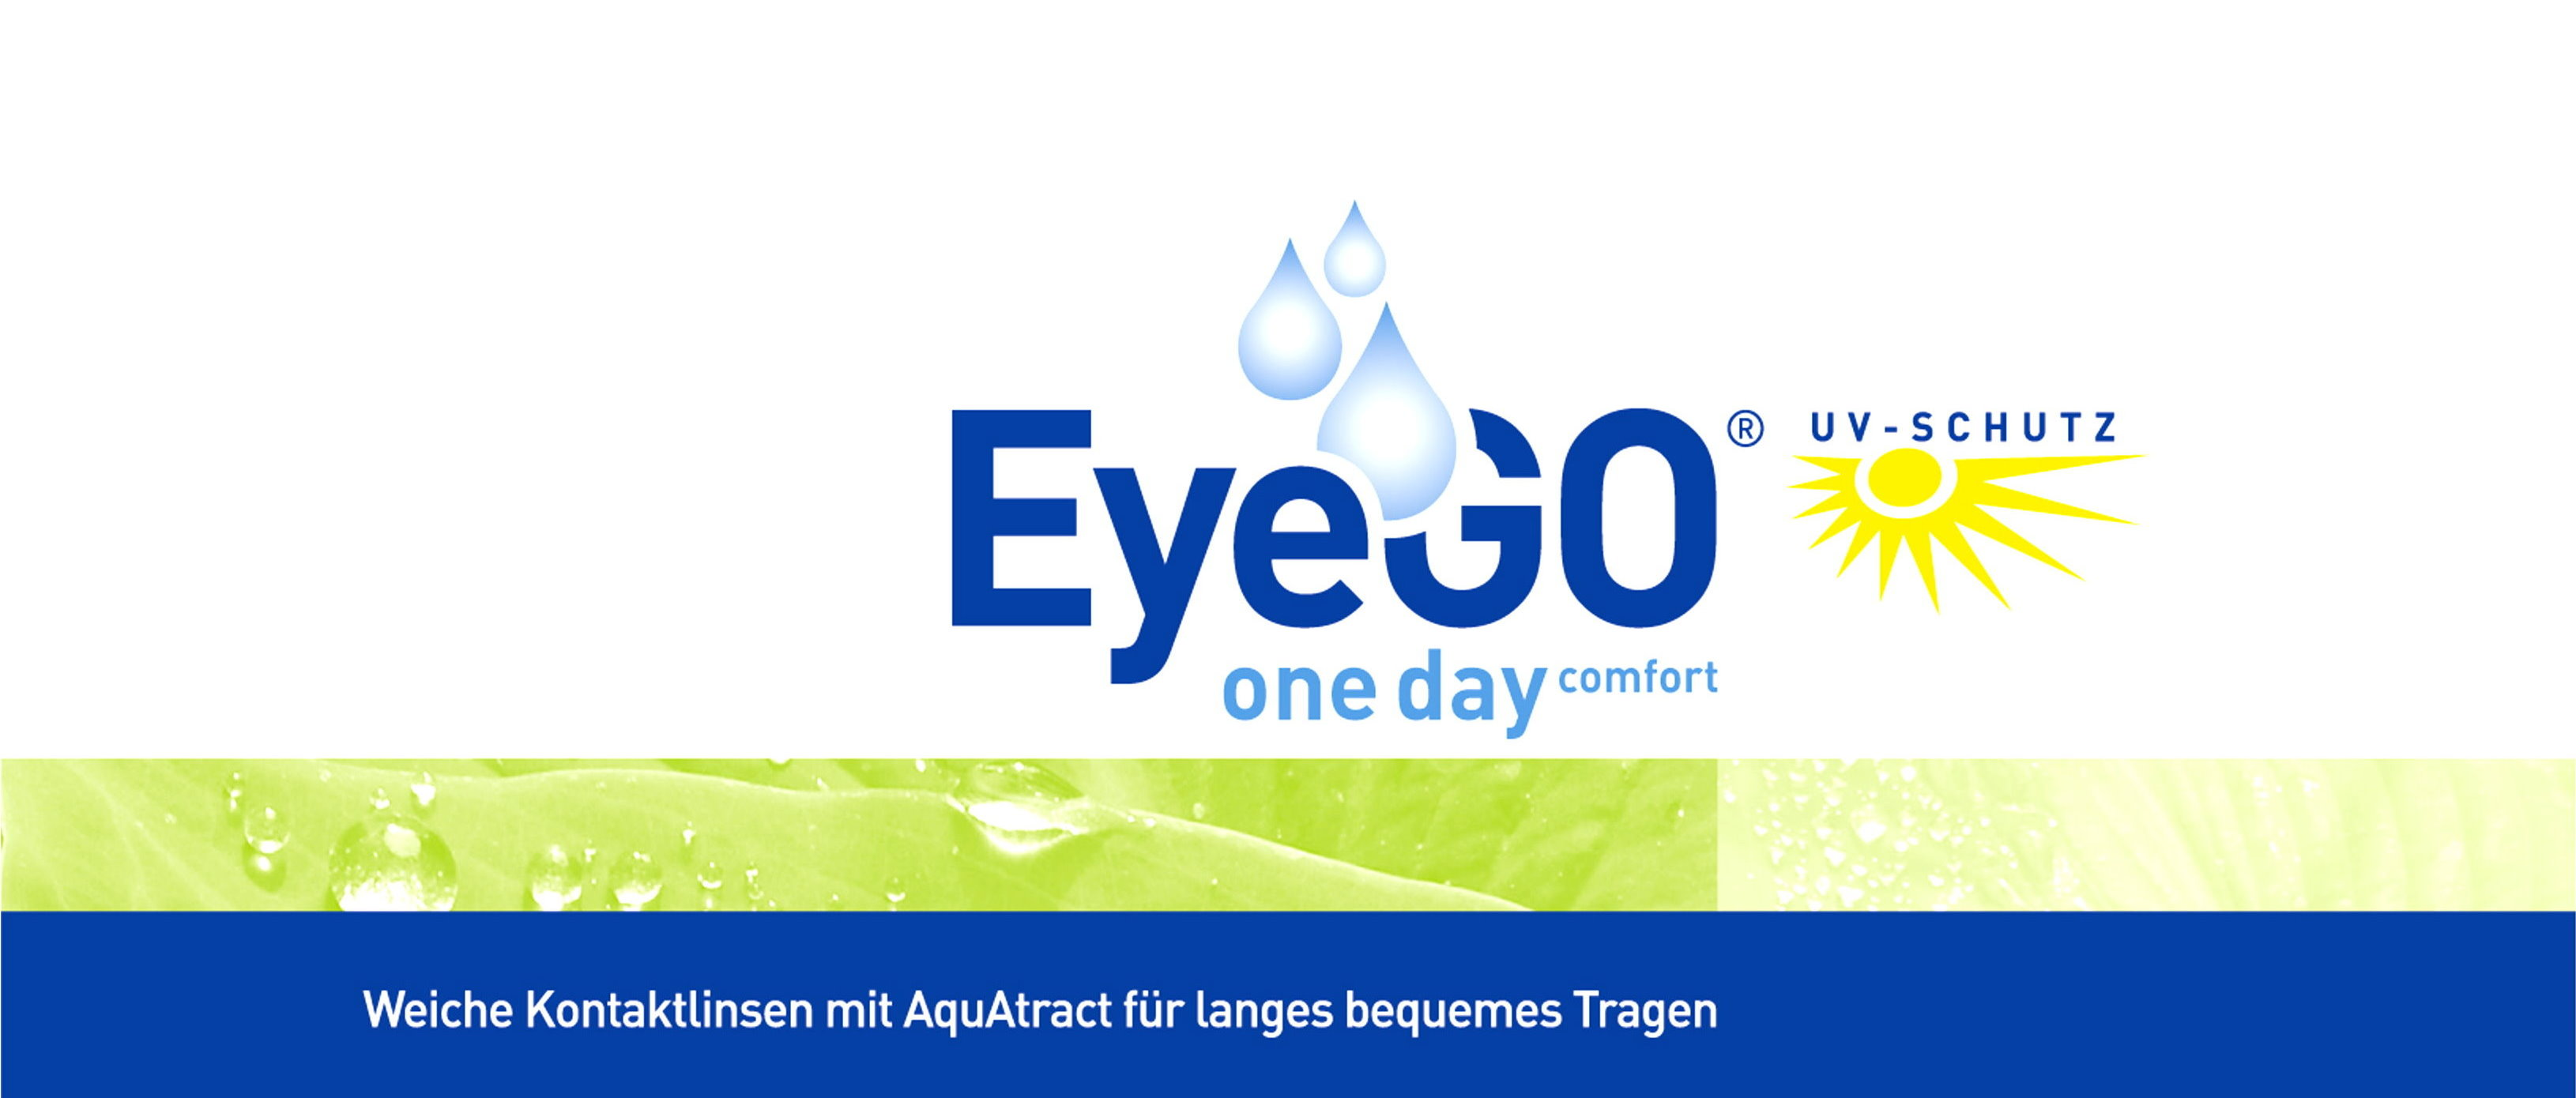 1-Day_30_EyeGO